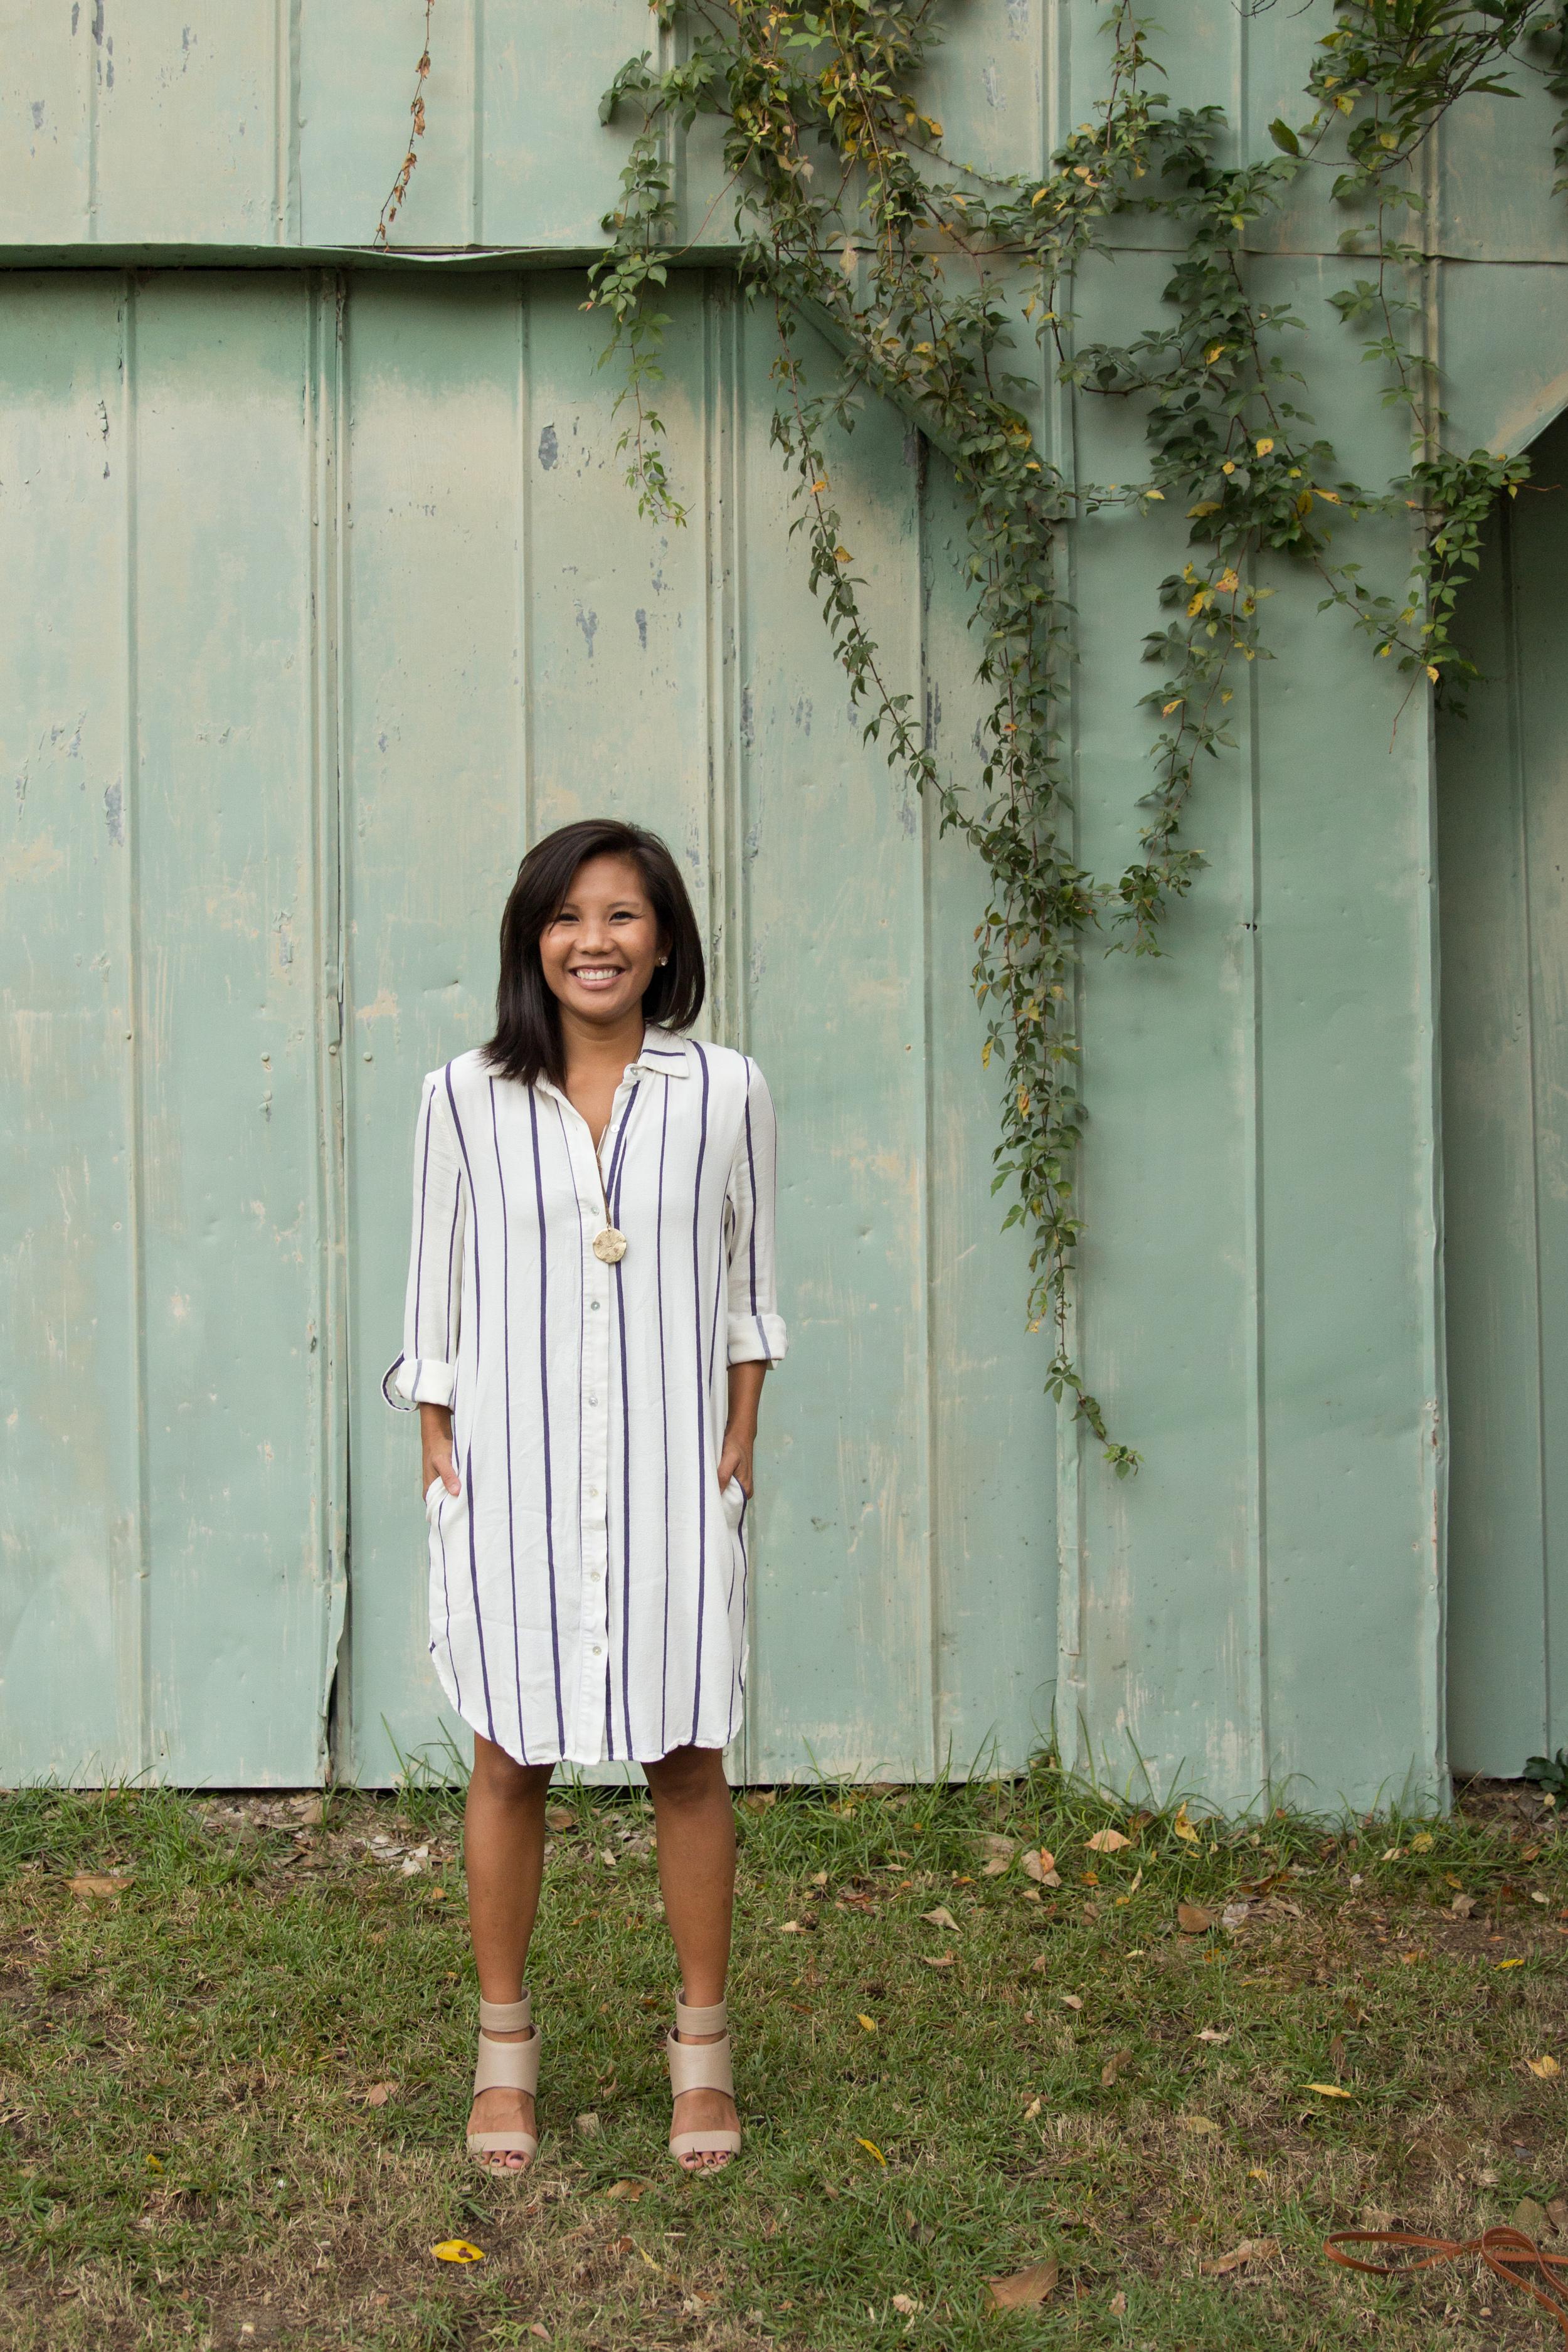 Shirt dress with heels